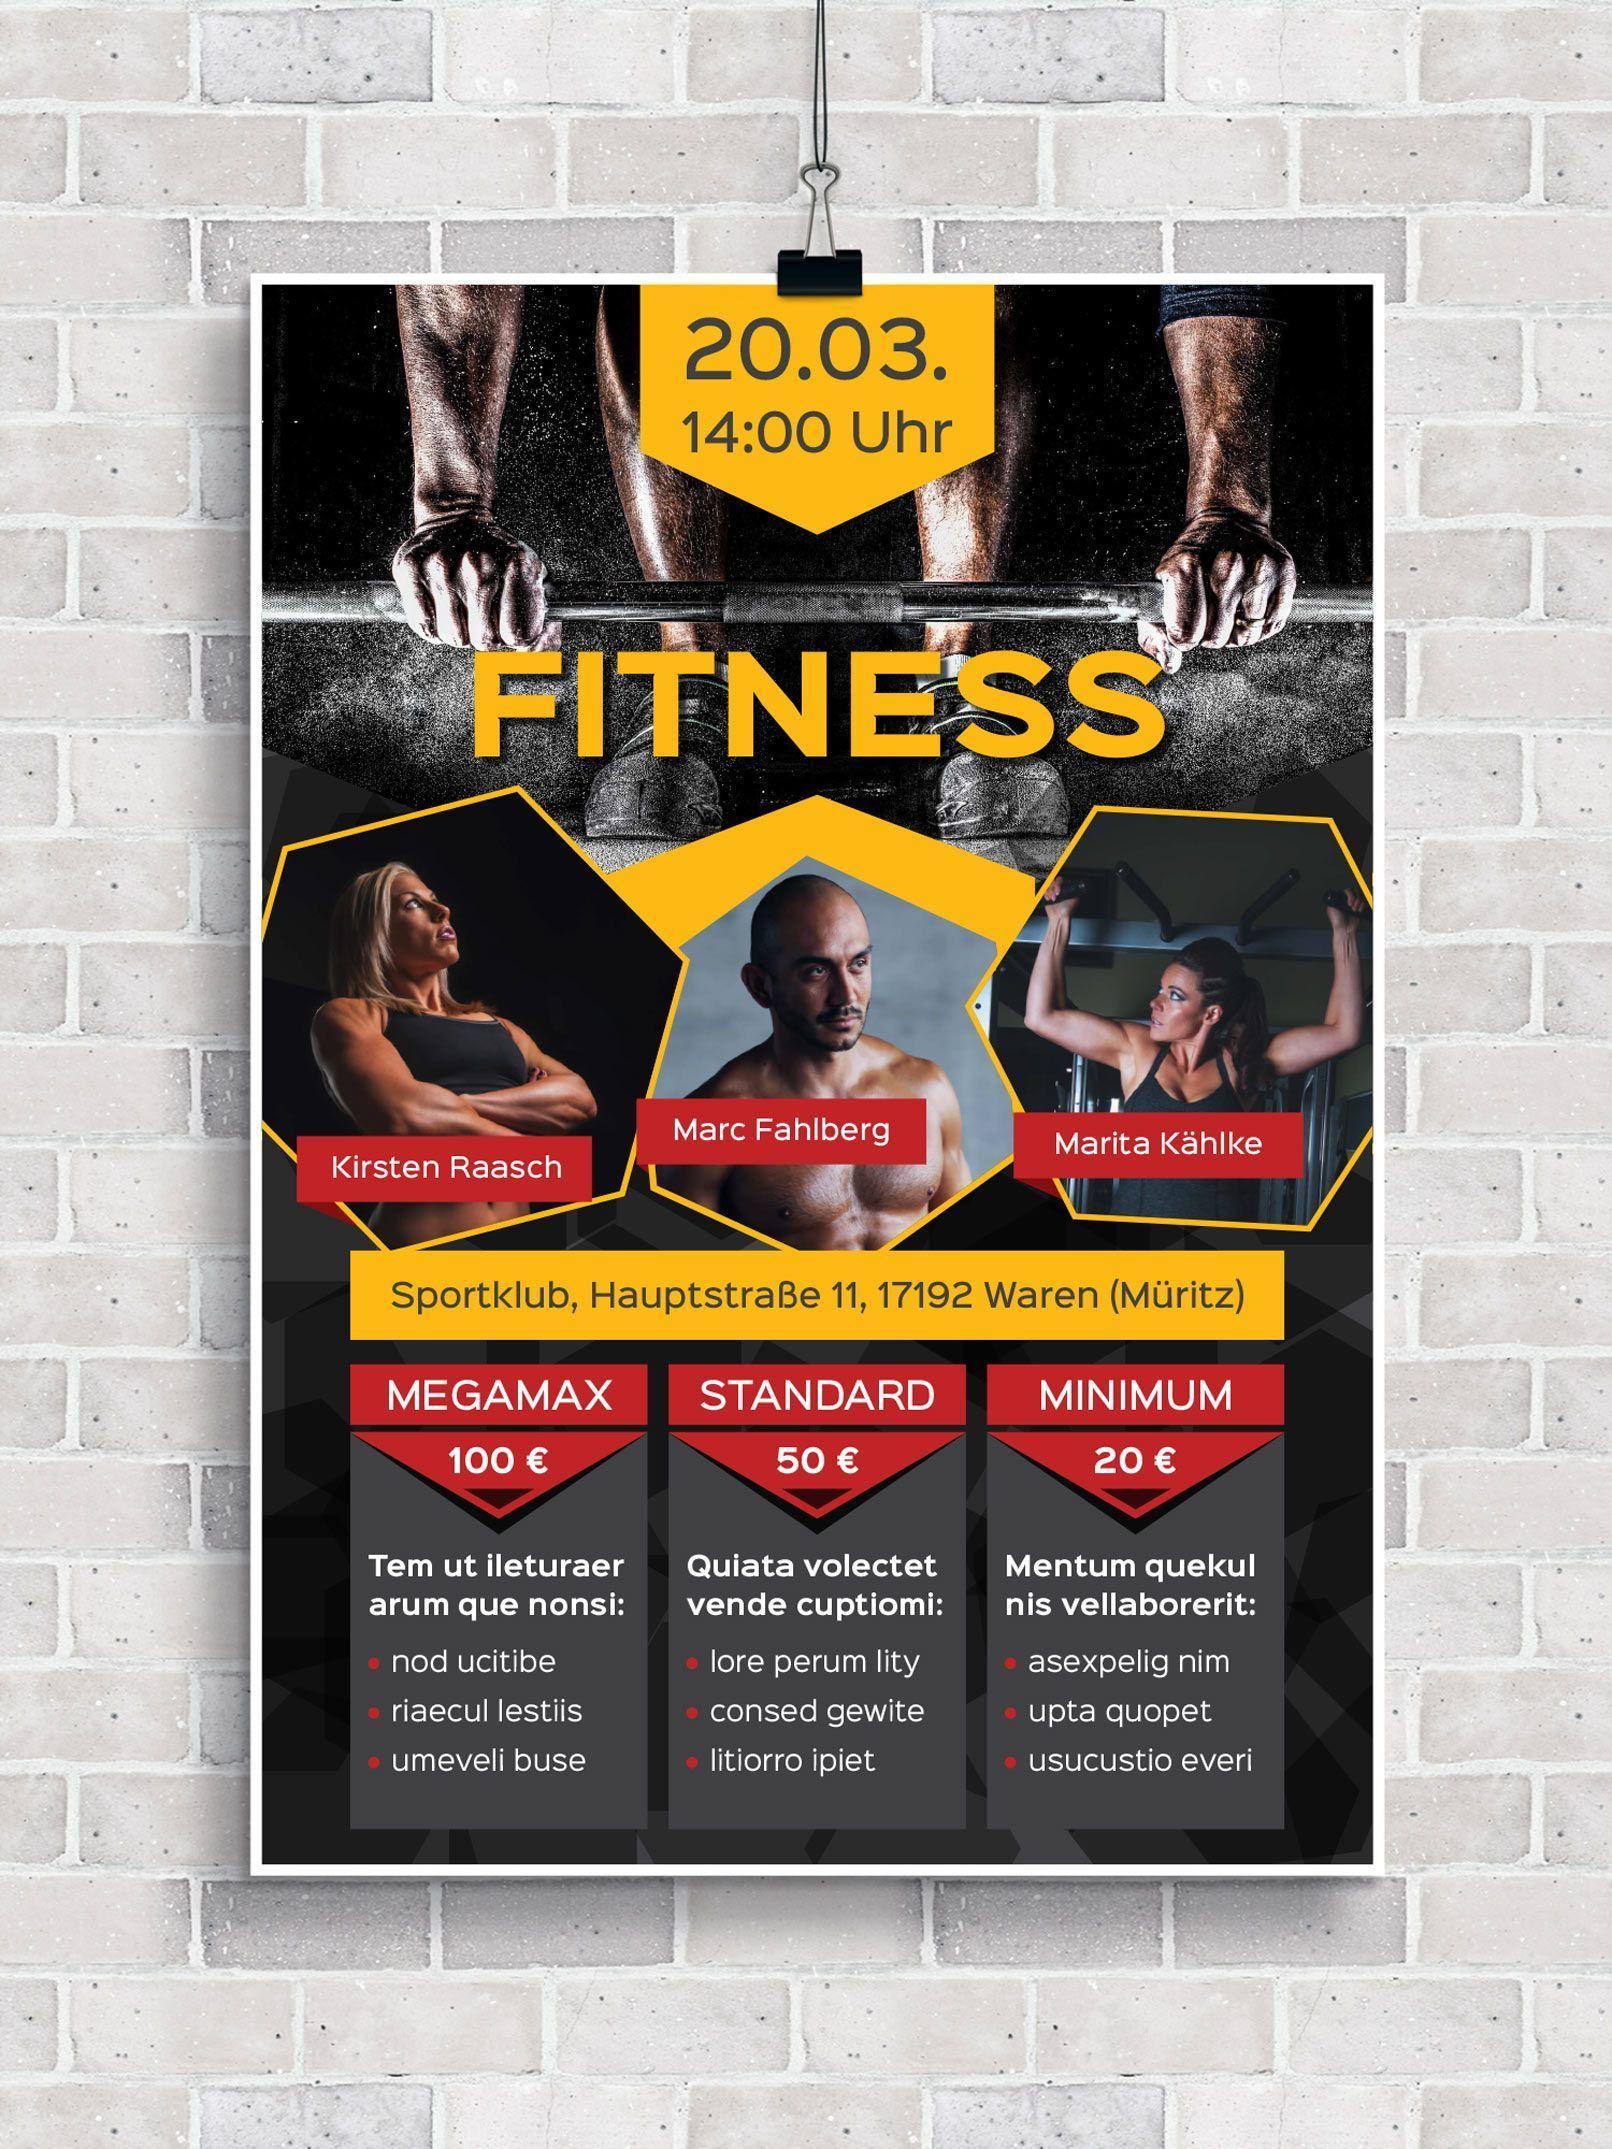 #fitness #Fitnessstudios #FlyerVorlagen #für #probetraining fitnessstudio #Sport #und Flyer-Vorlagen...